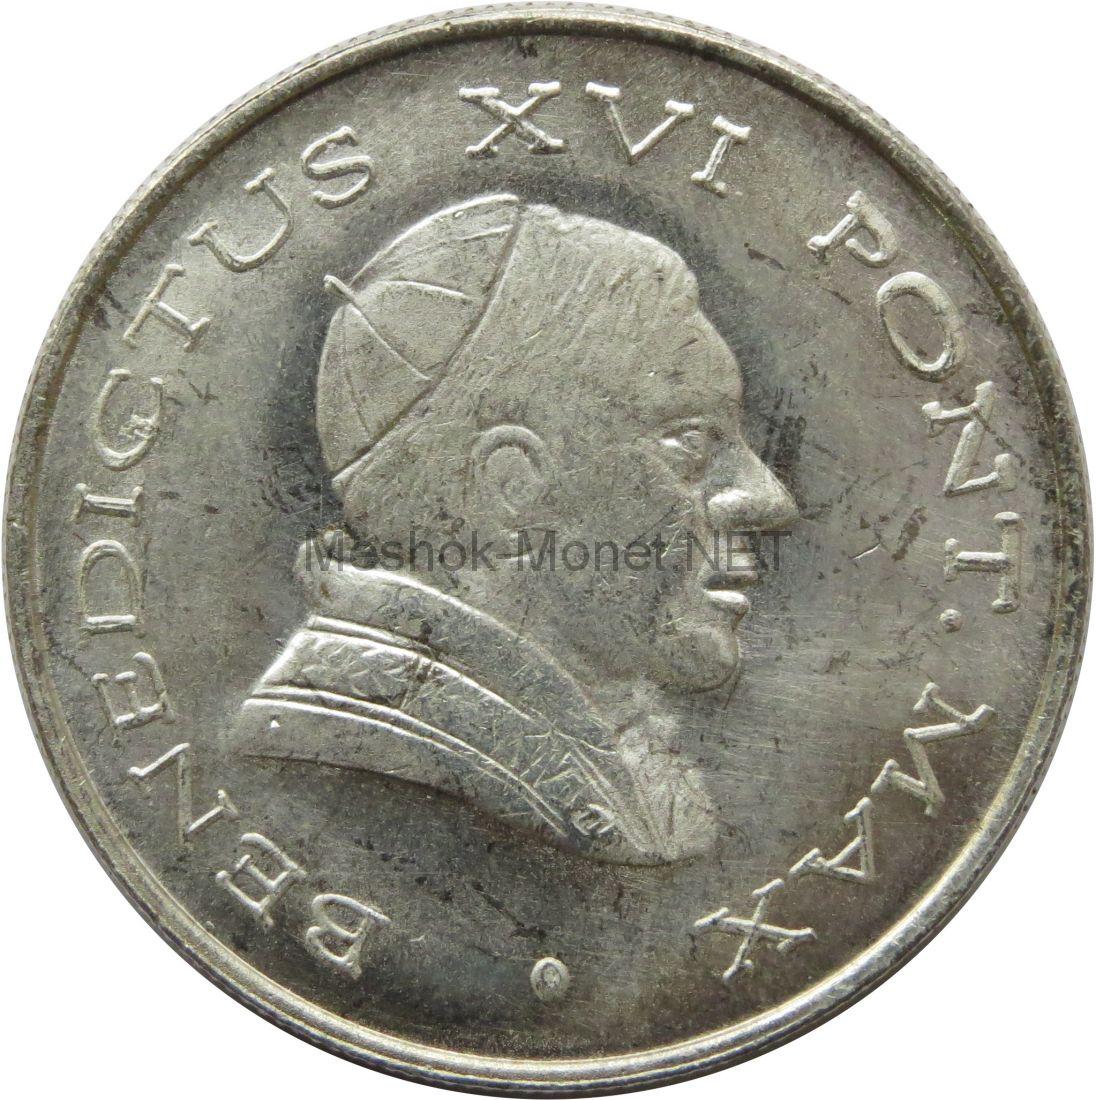 Копия монеты BENEDICTUS XVI PONT.MAX, ПАПА РИМСКИЙ Бенедикт XVI